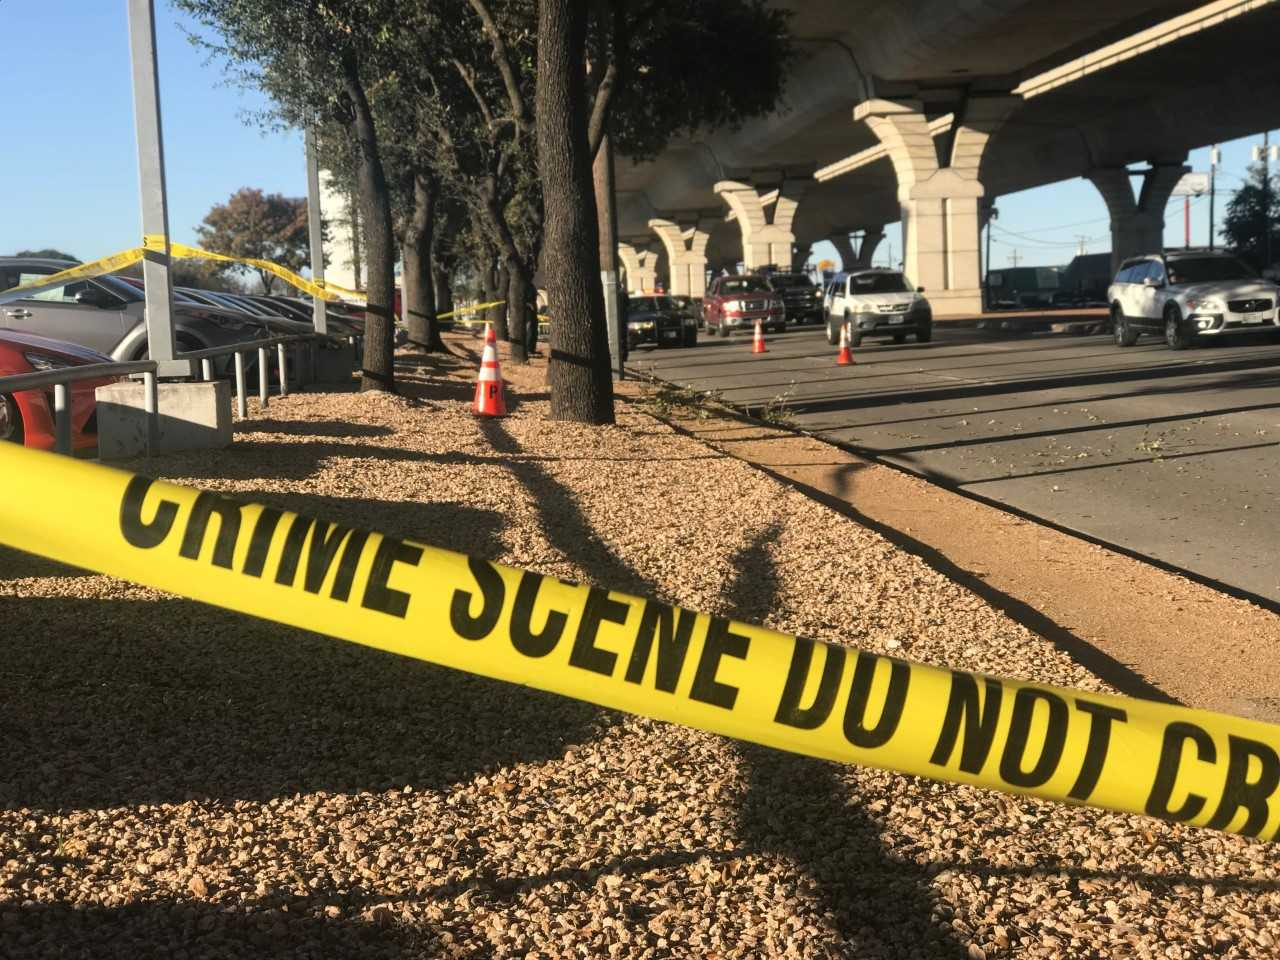 A motorcyclist fell 20-25 feet off of US 183 onto Research Boulevard near Lazy Lane on Dec. 12, 2017 (KXAN Photo_Frank Martinez)_596748